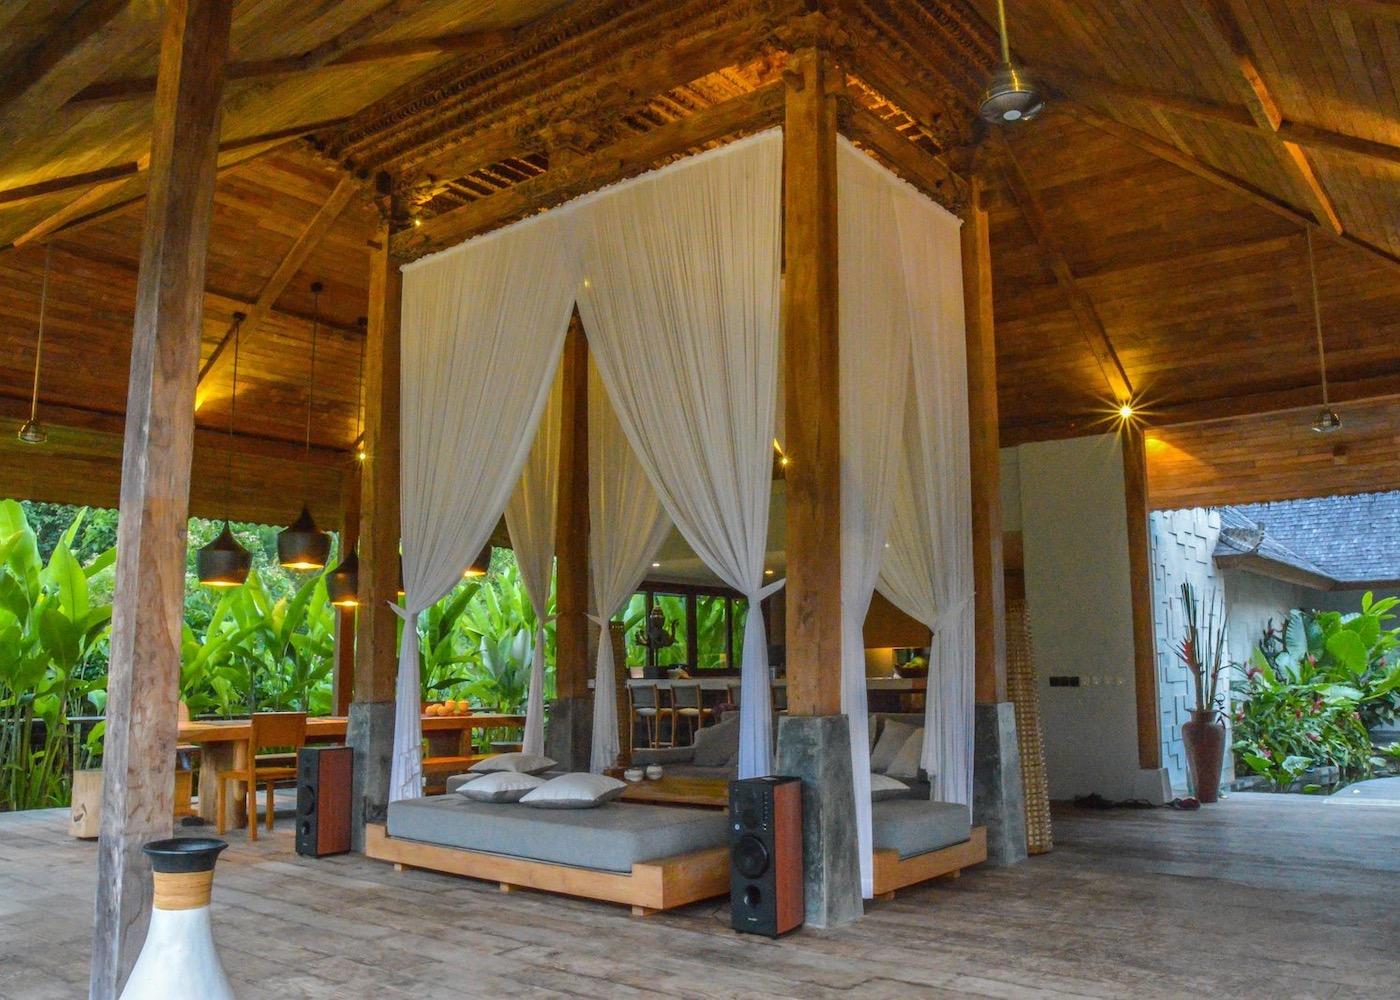 Villa Lumia in Ubud - the best family-friendly villas in Bali, Indonesia